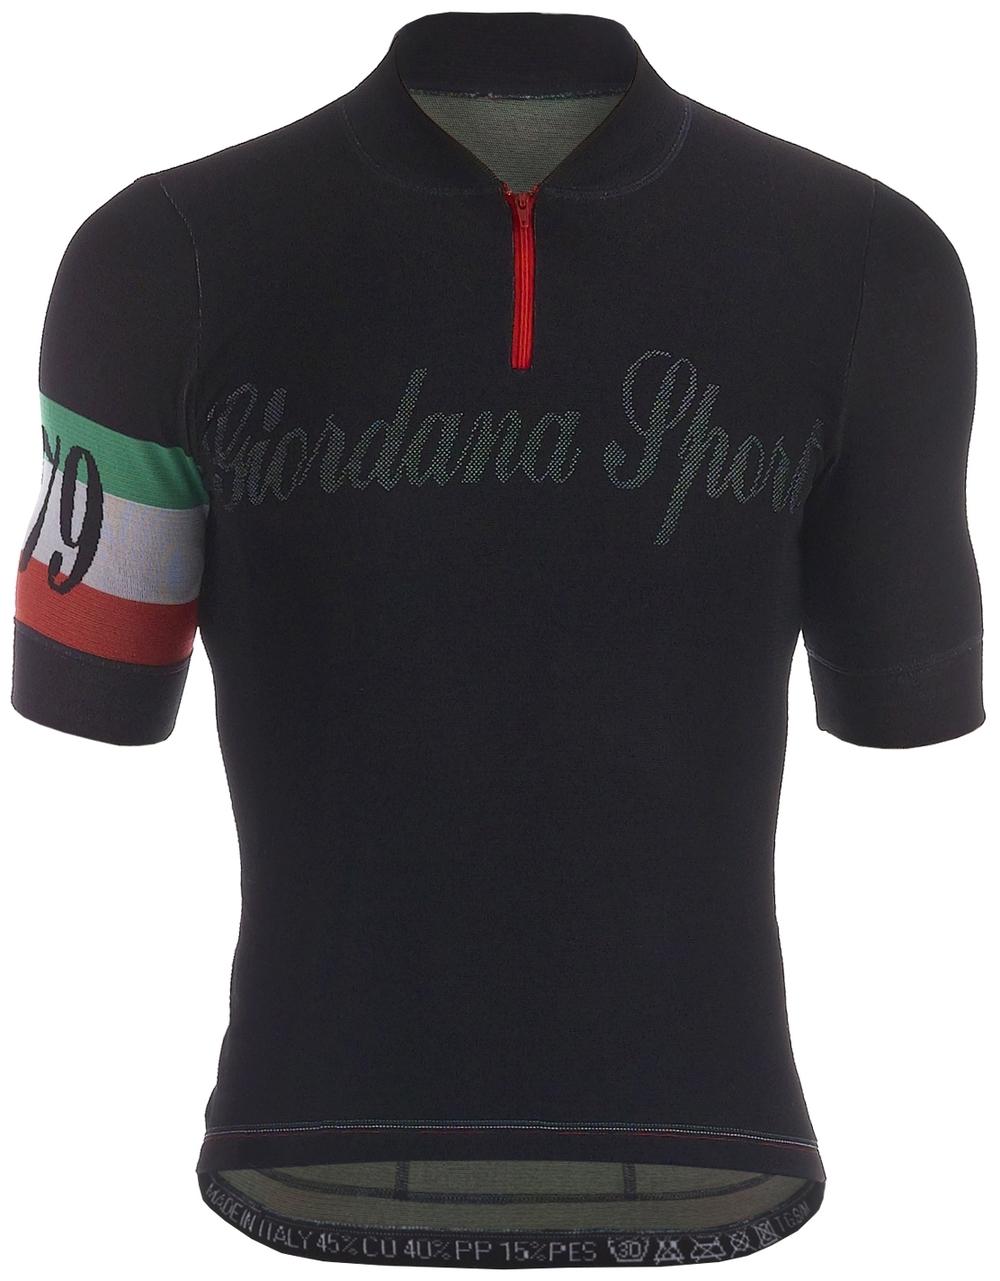 Giordana Sport Classic Performance Wool Jersey, $130